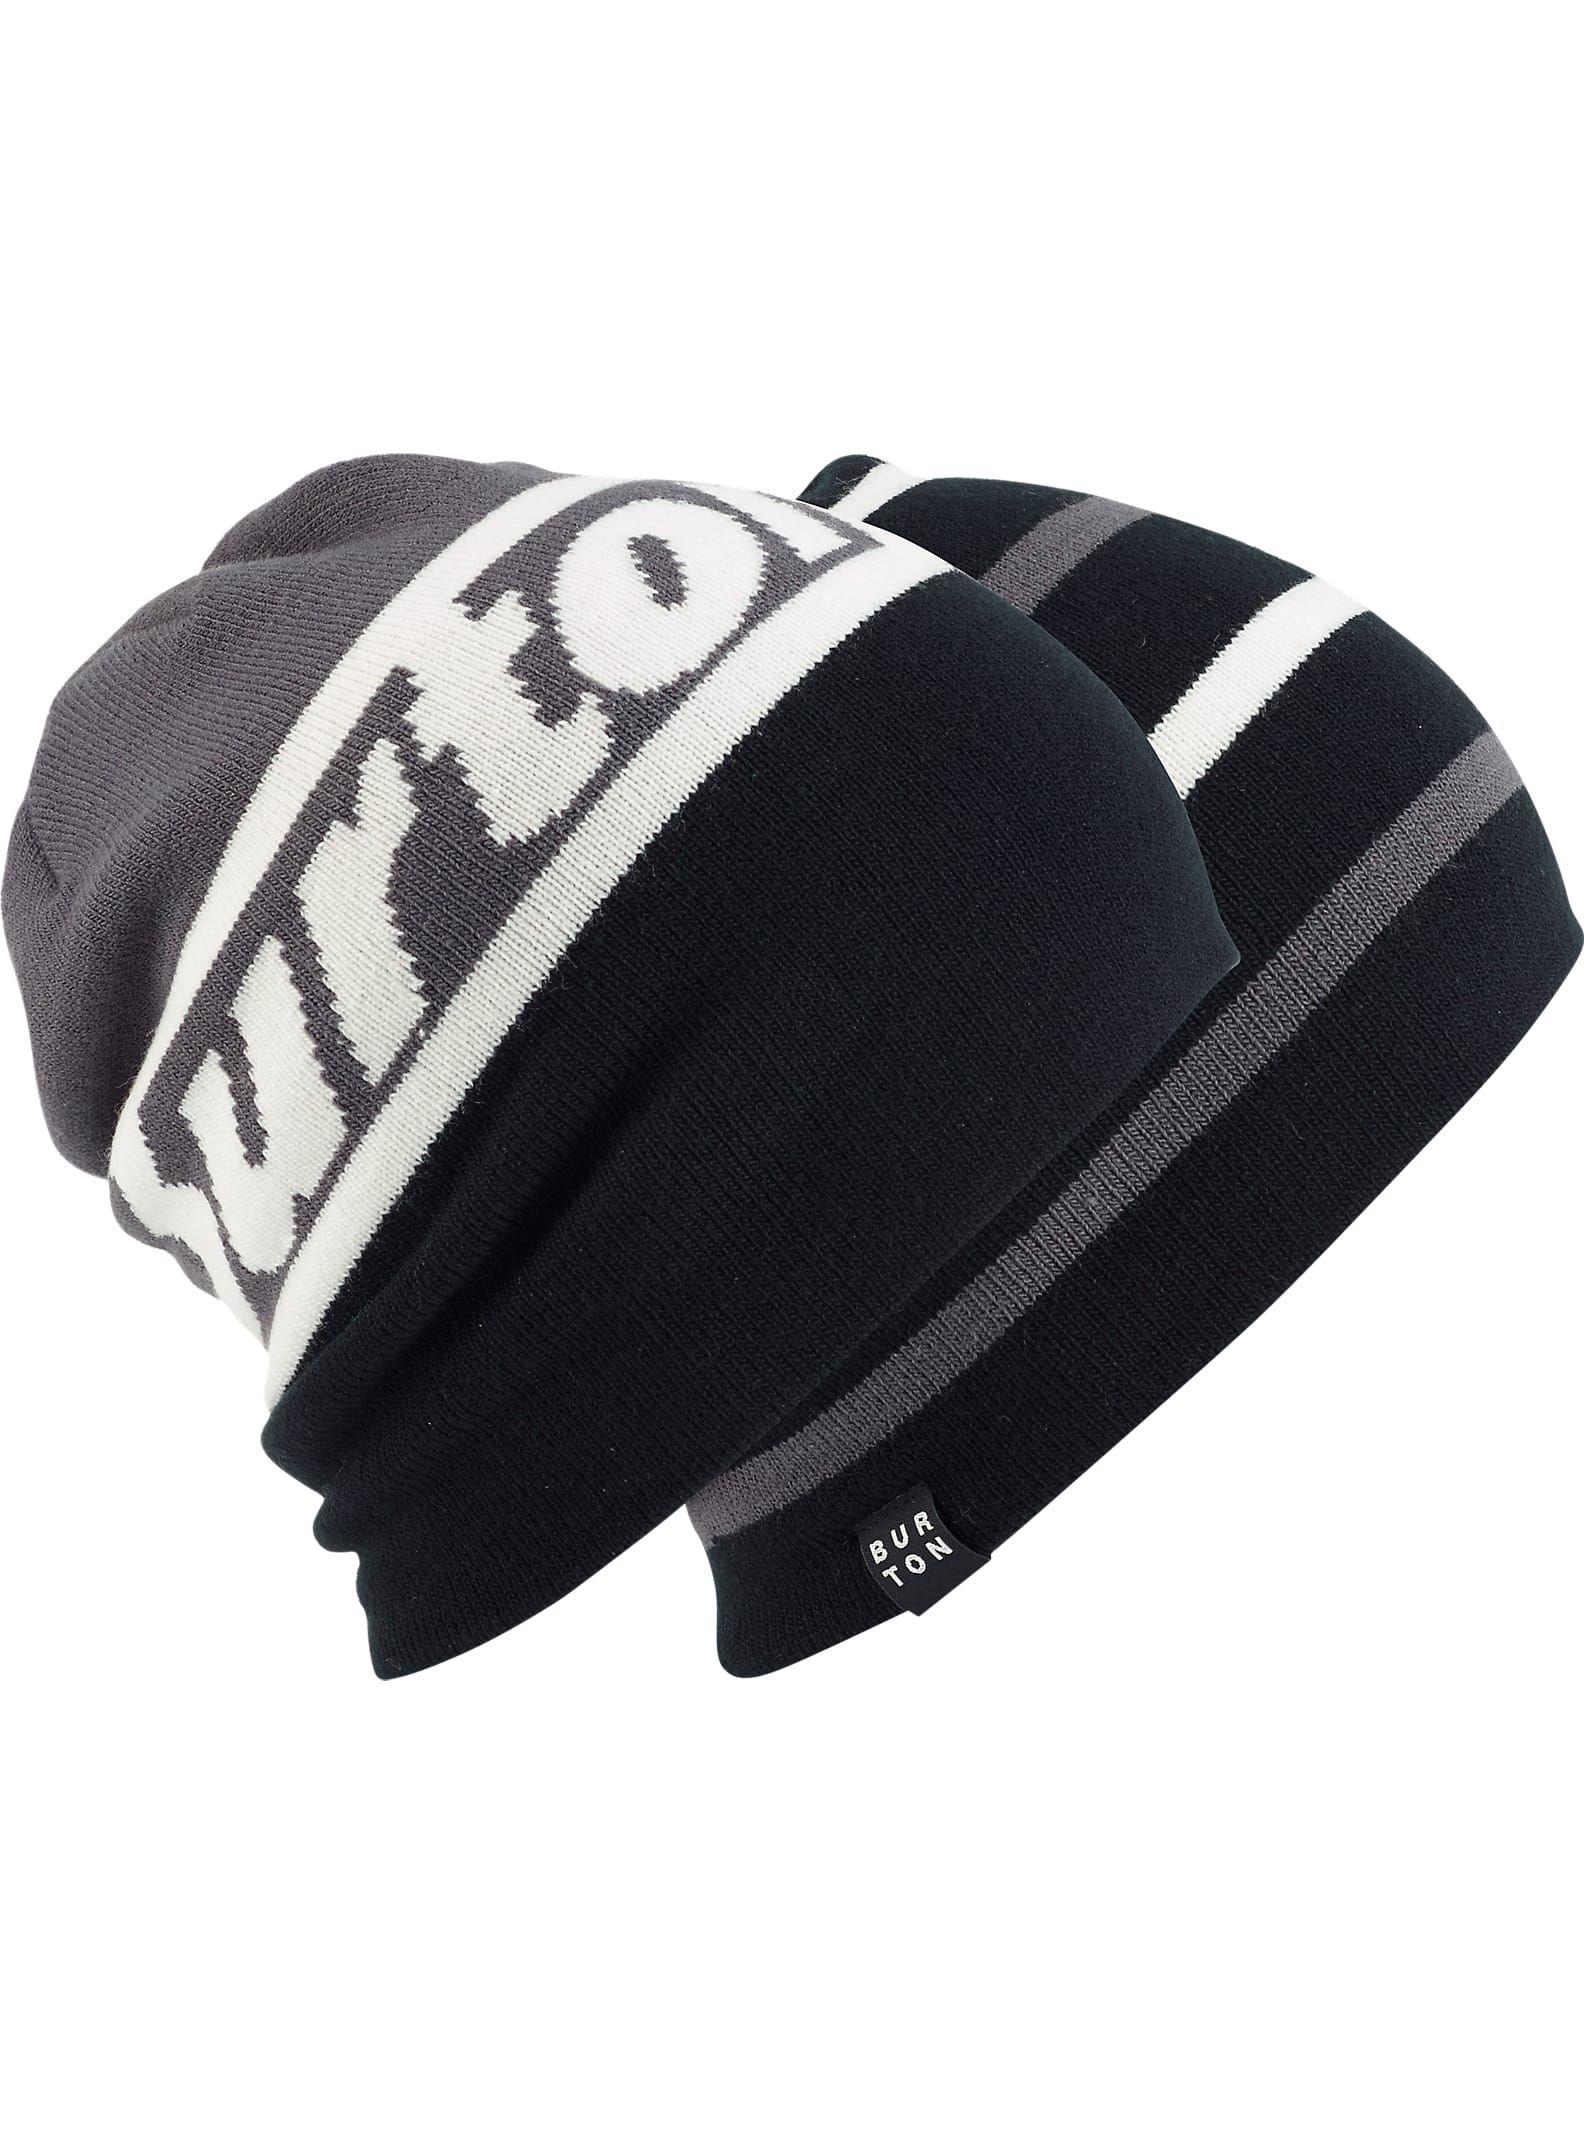 30fb22201ec0b2 Burton Beanie 2-Pack - Reversible Burton Ski, Burton Beanie, Winter Hats For